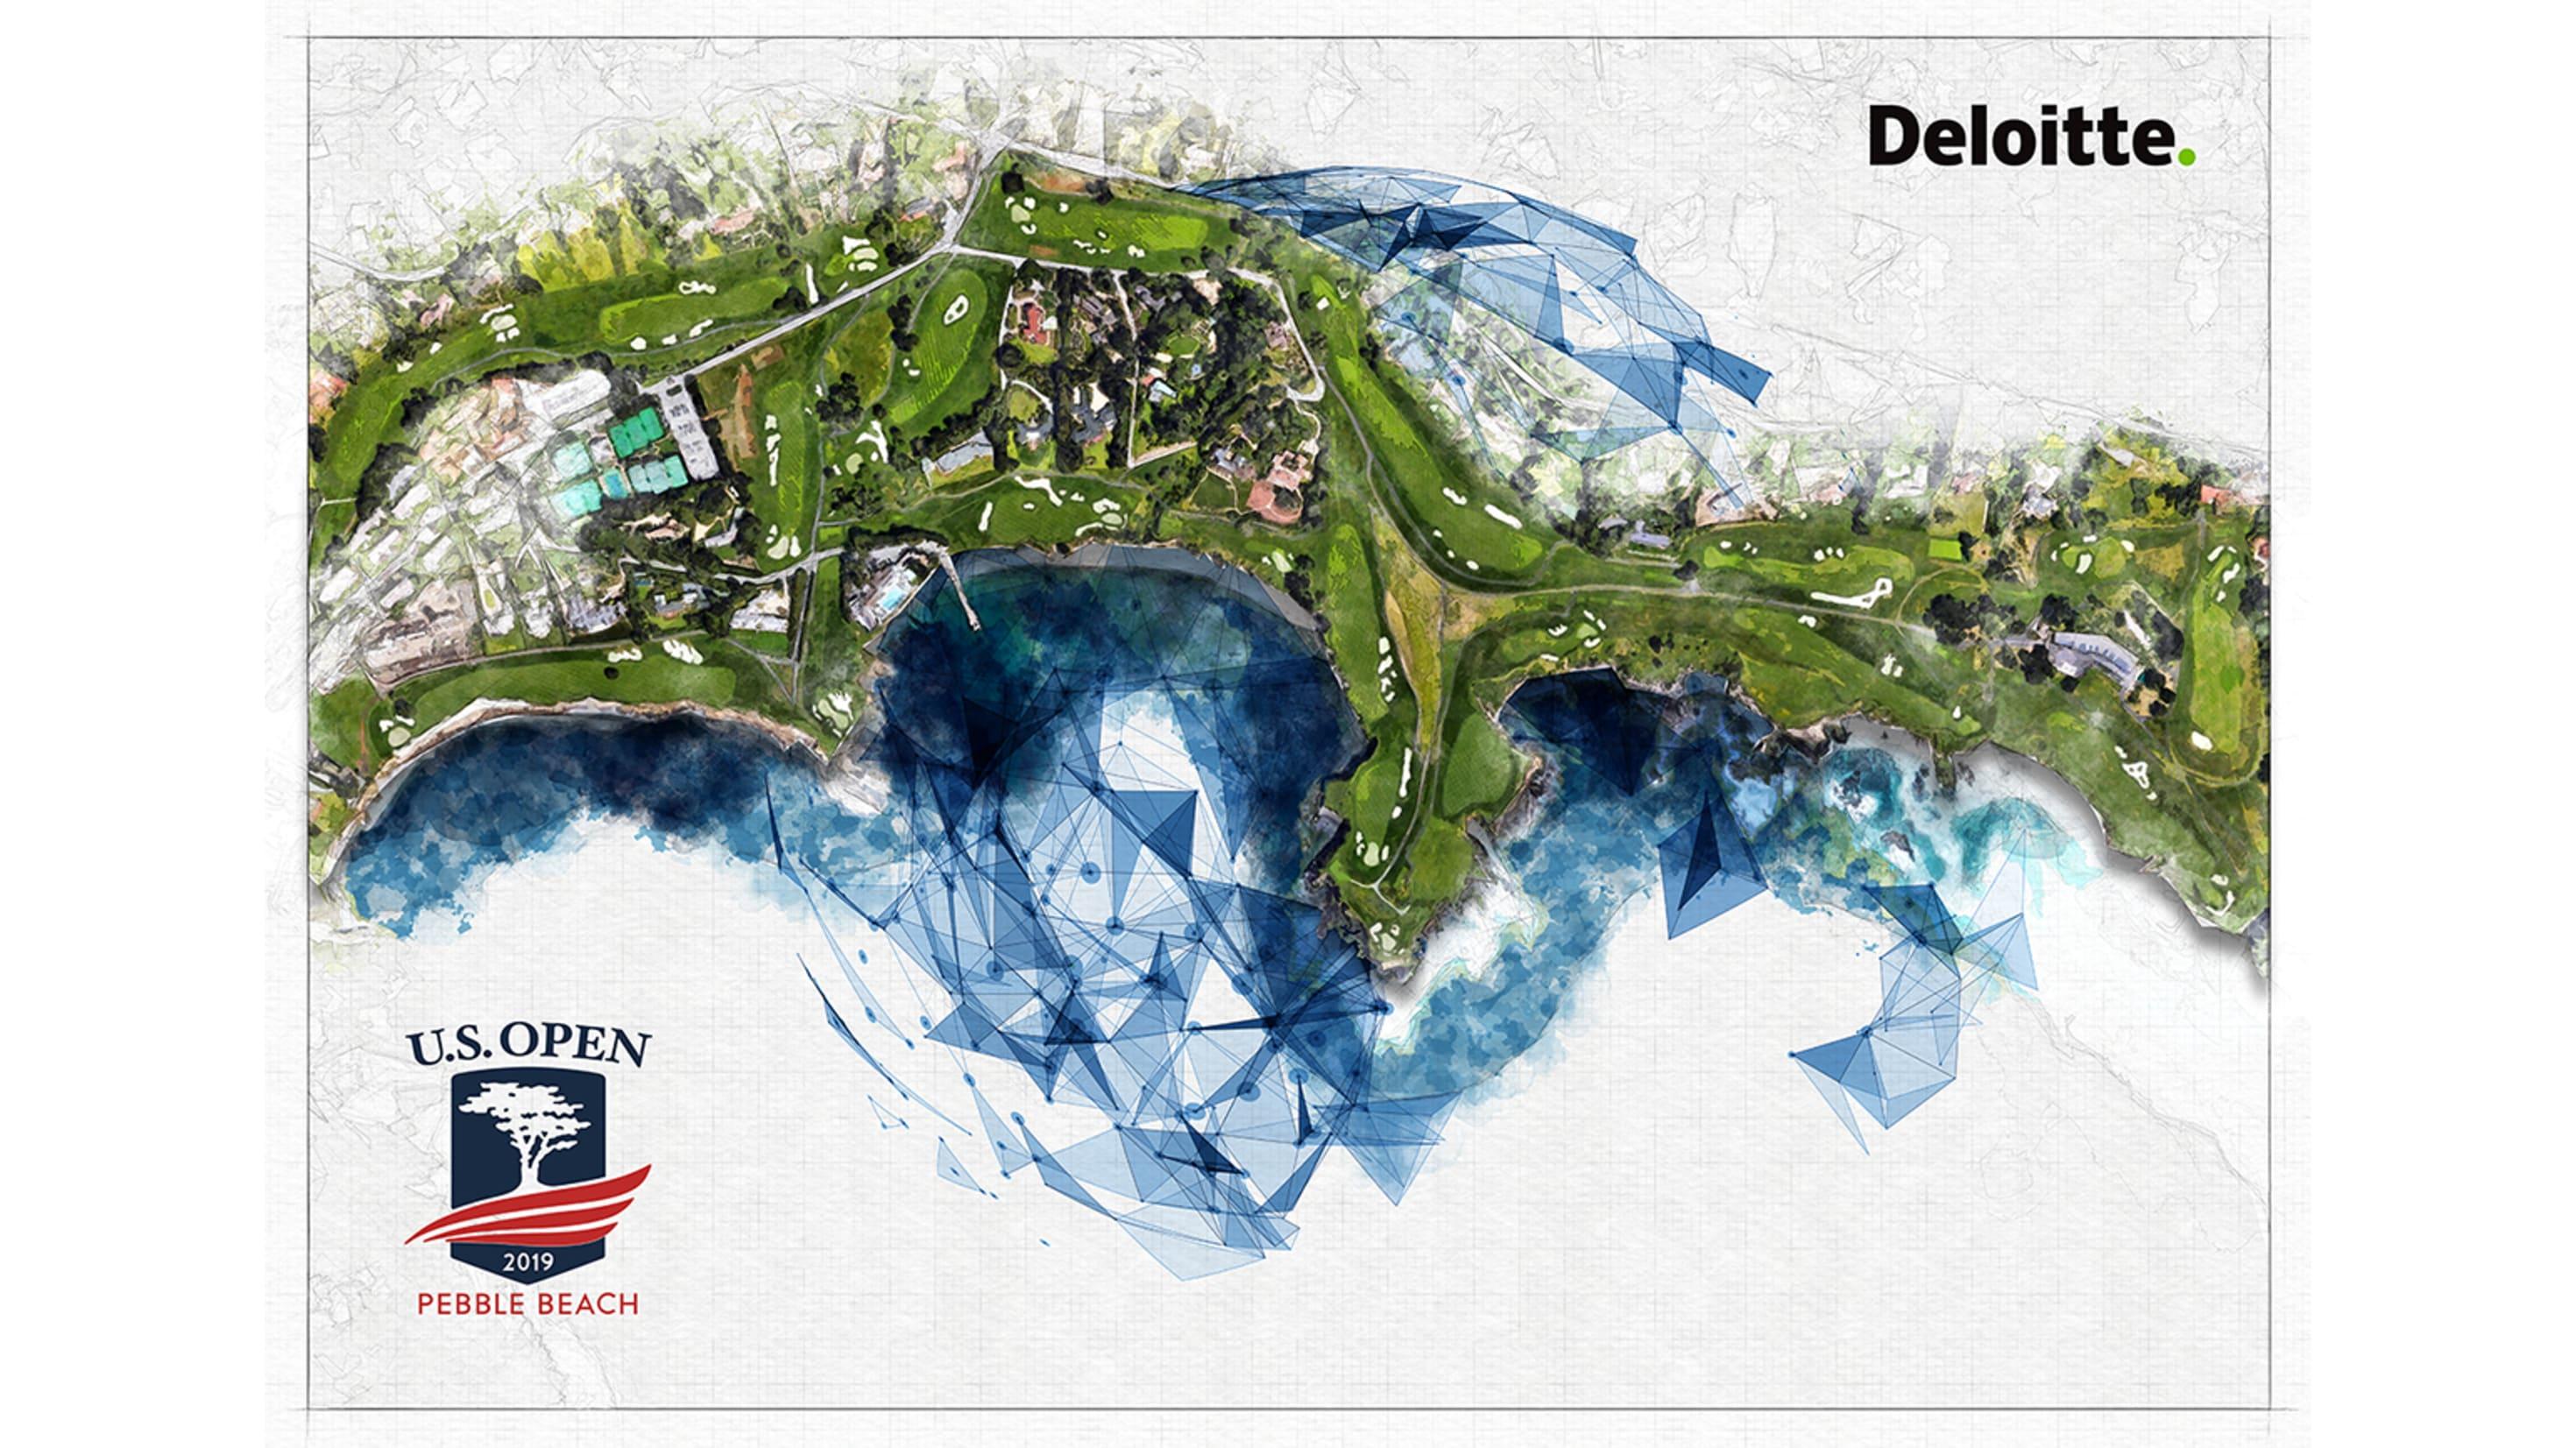 USGA and Deloitte Launch U.S. Open Augmented Reality App